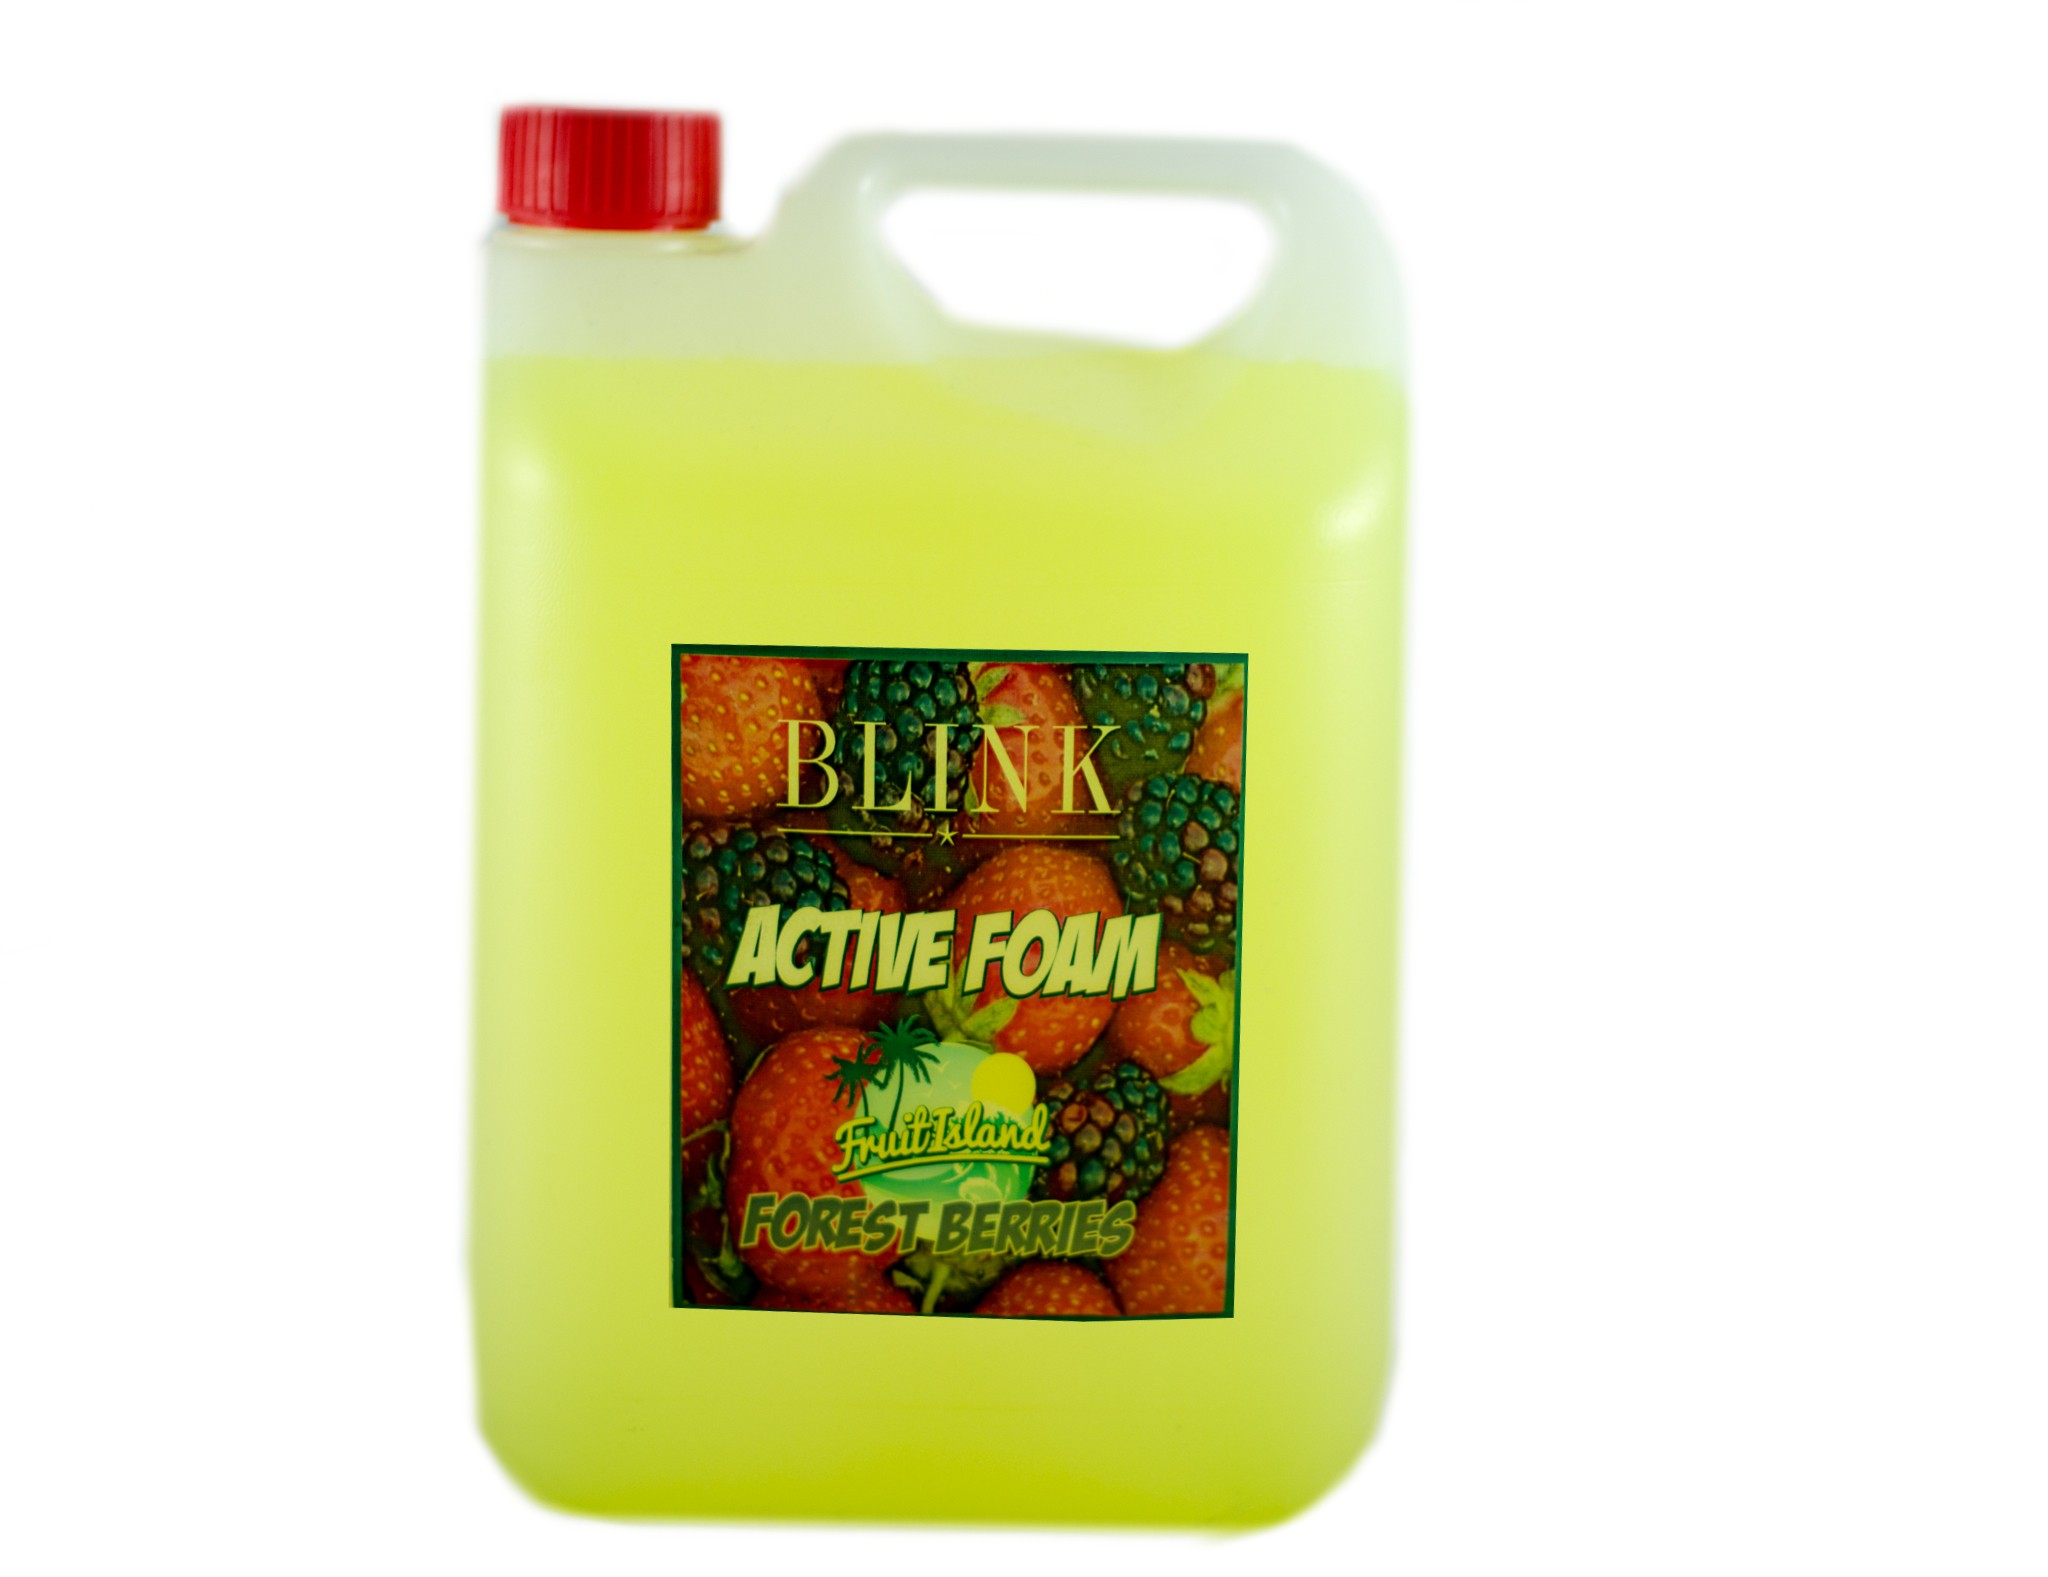 Blink Active Foam Forest Berries 5L